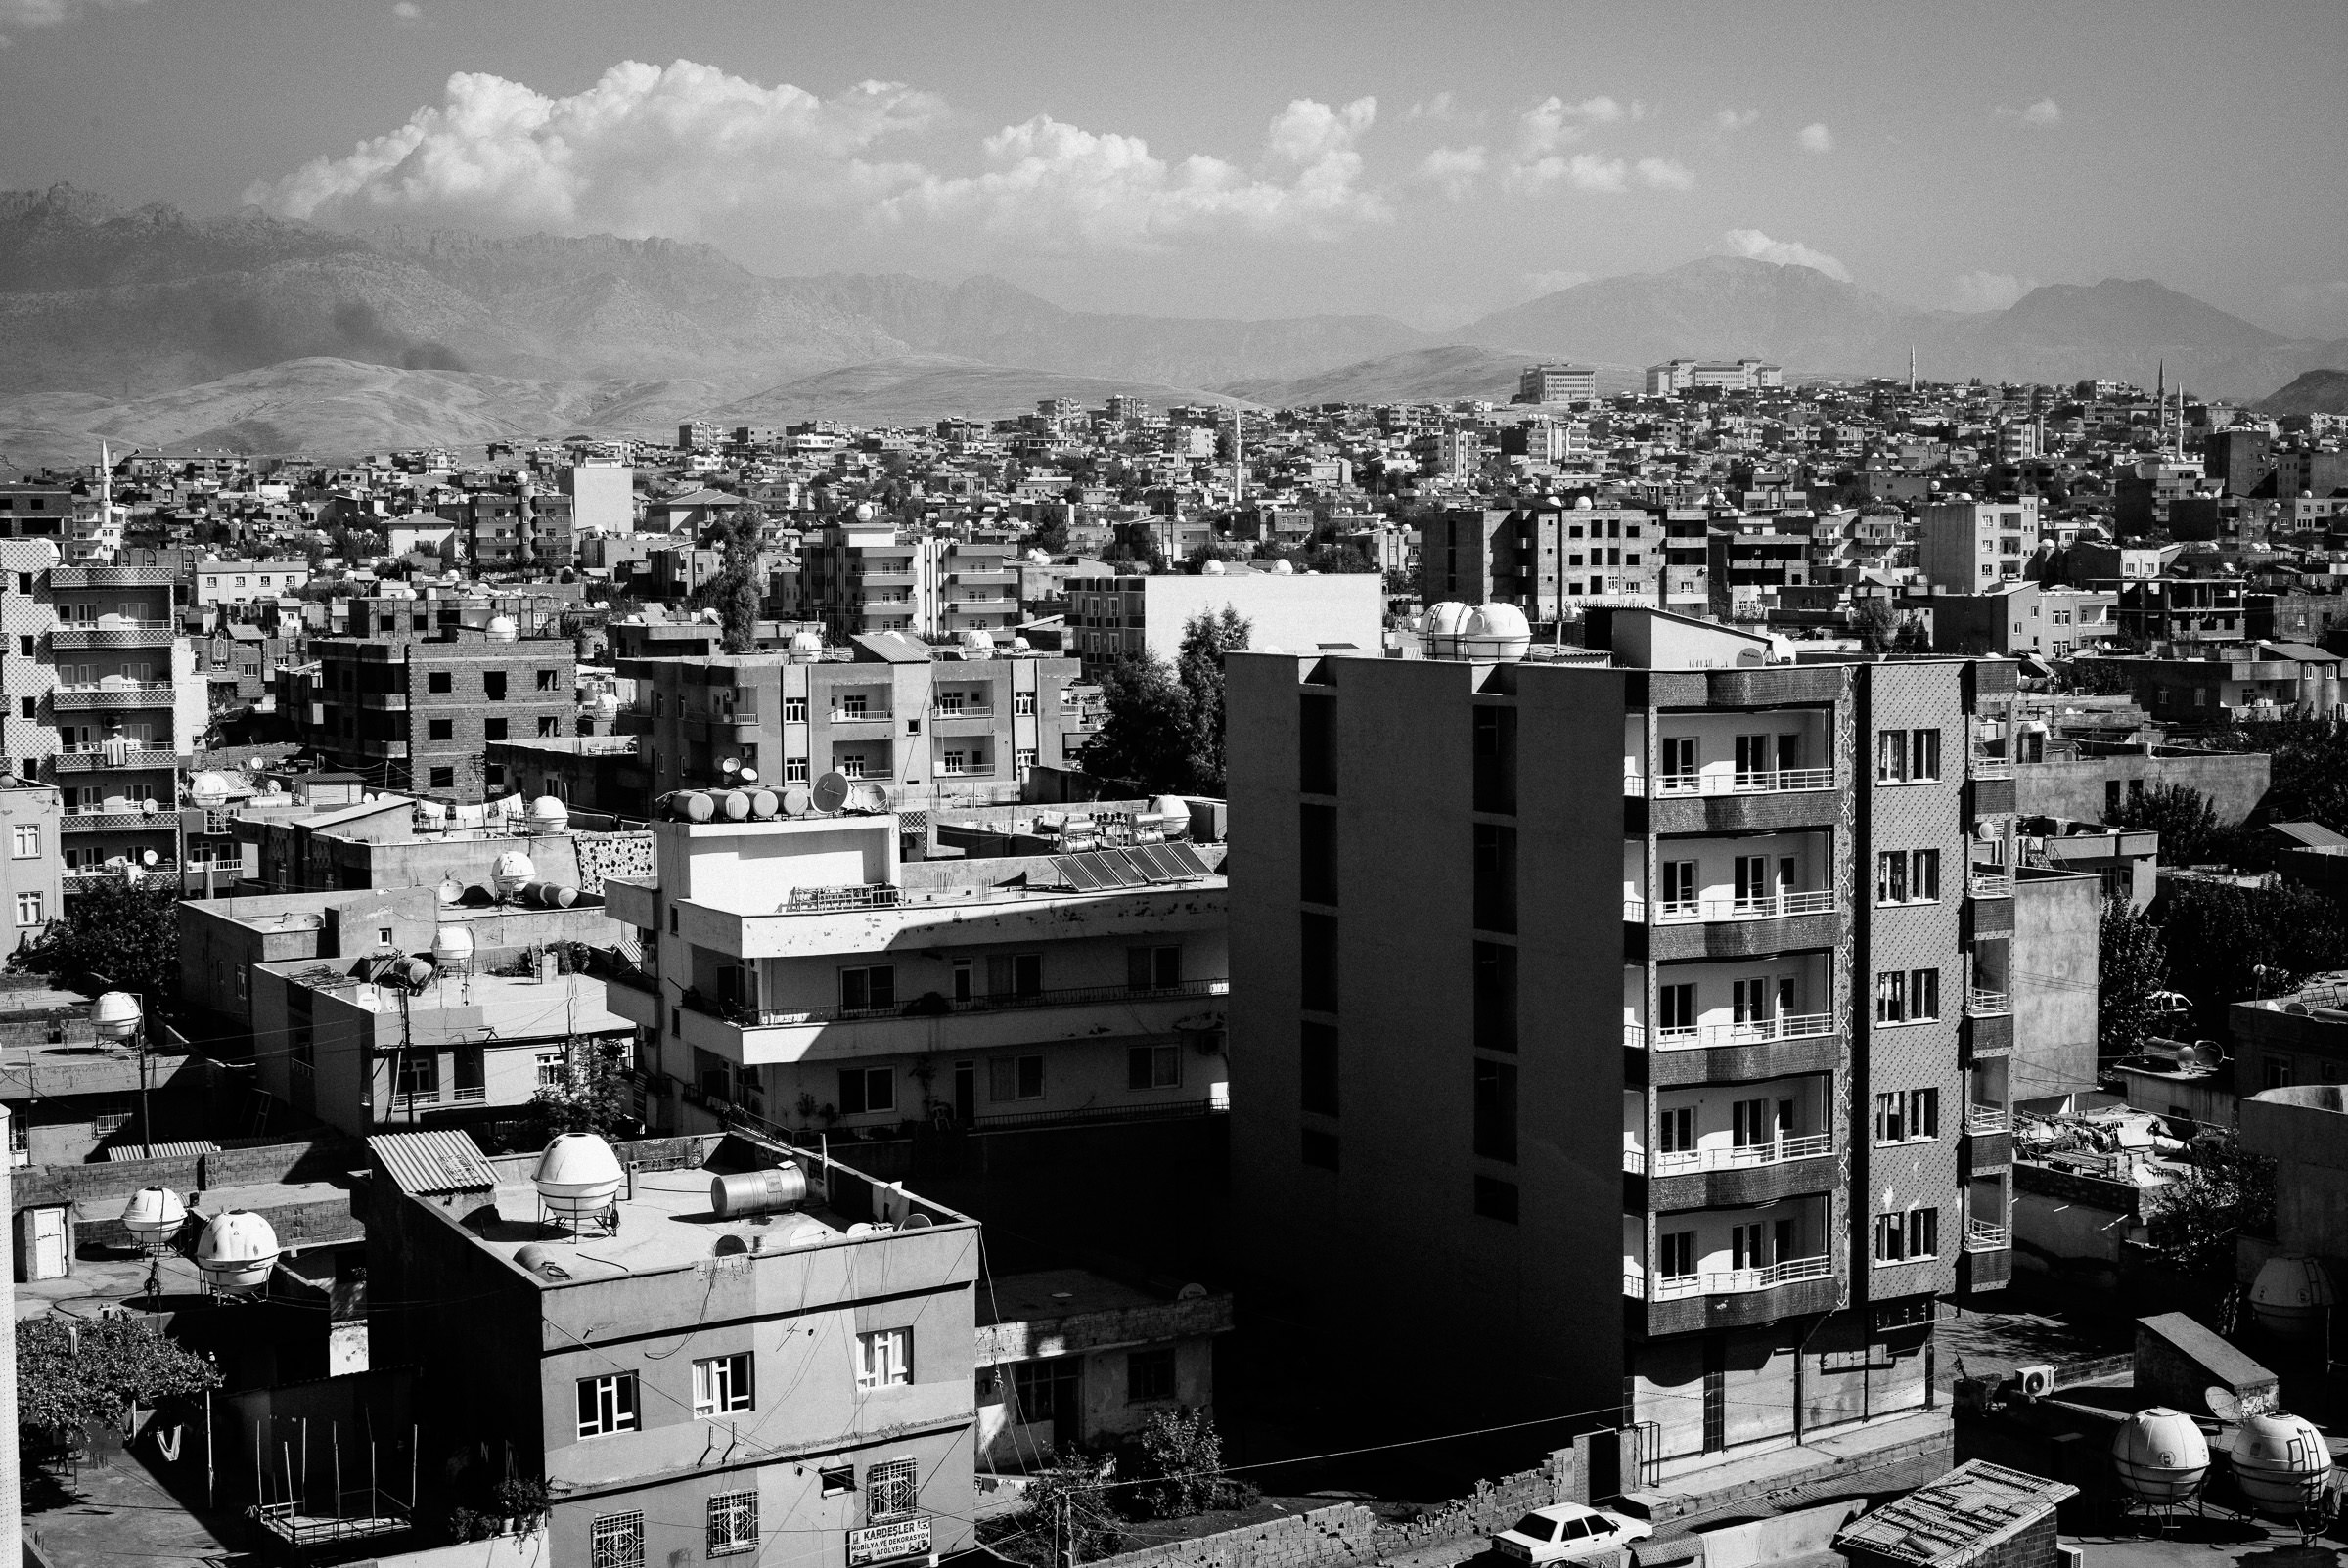 brandon_patoc_travel_photographer_in_turkey_0011.jpg